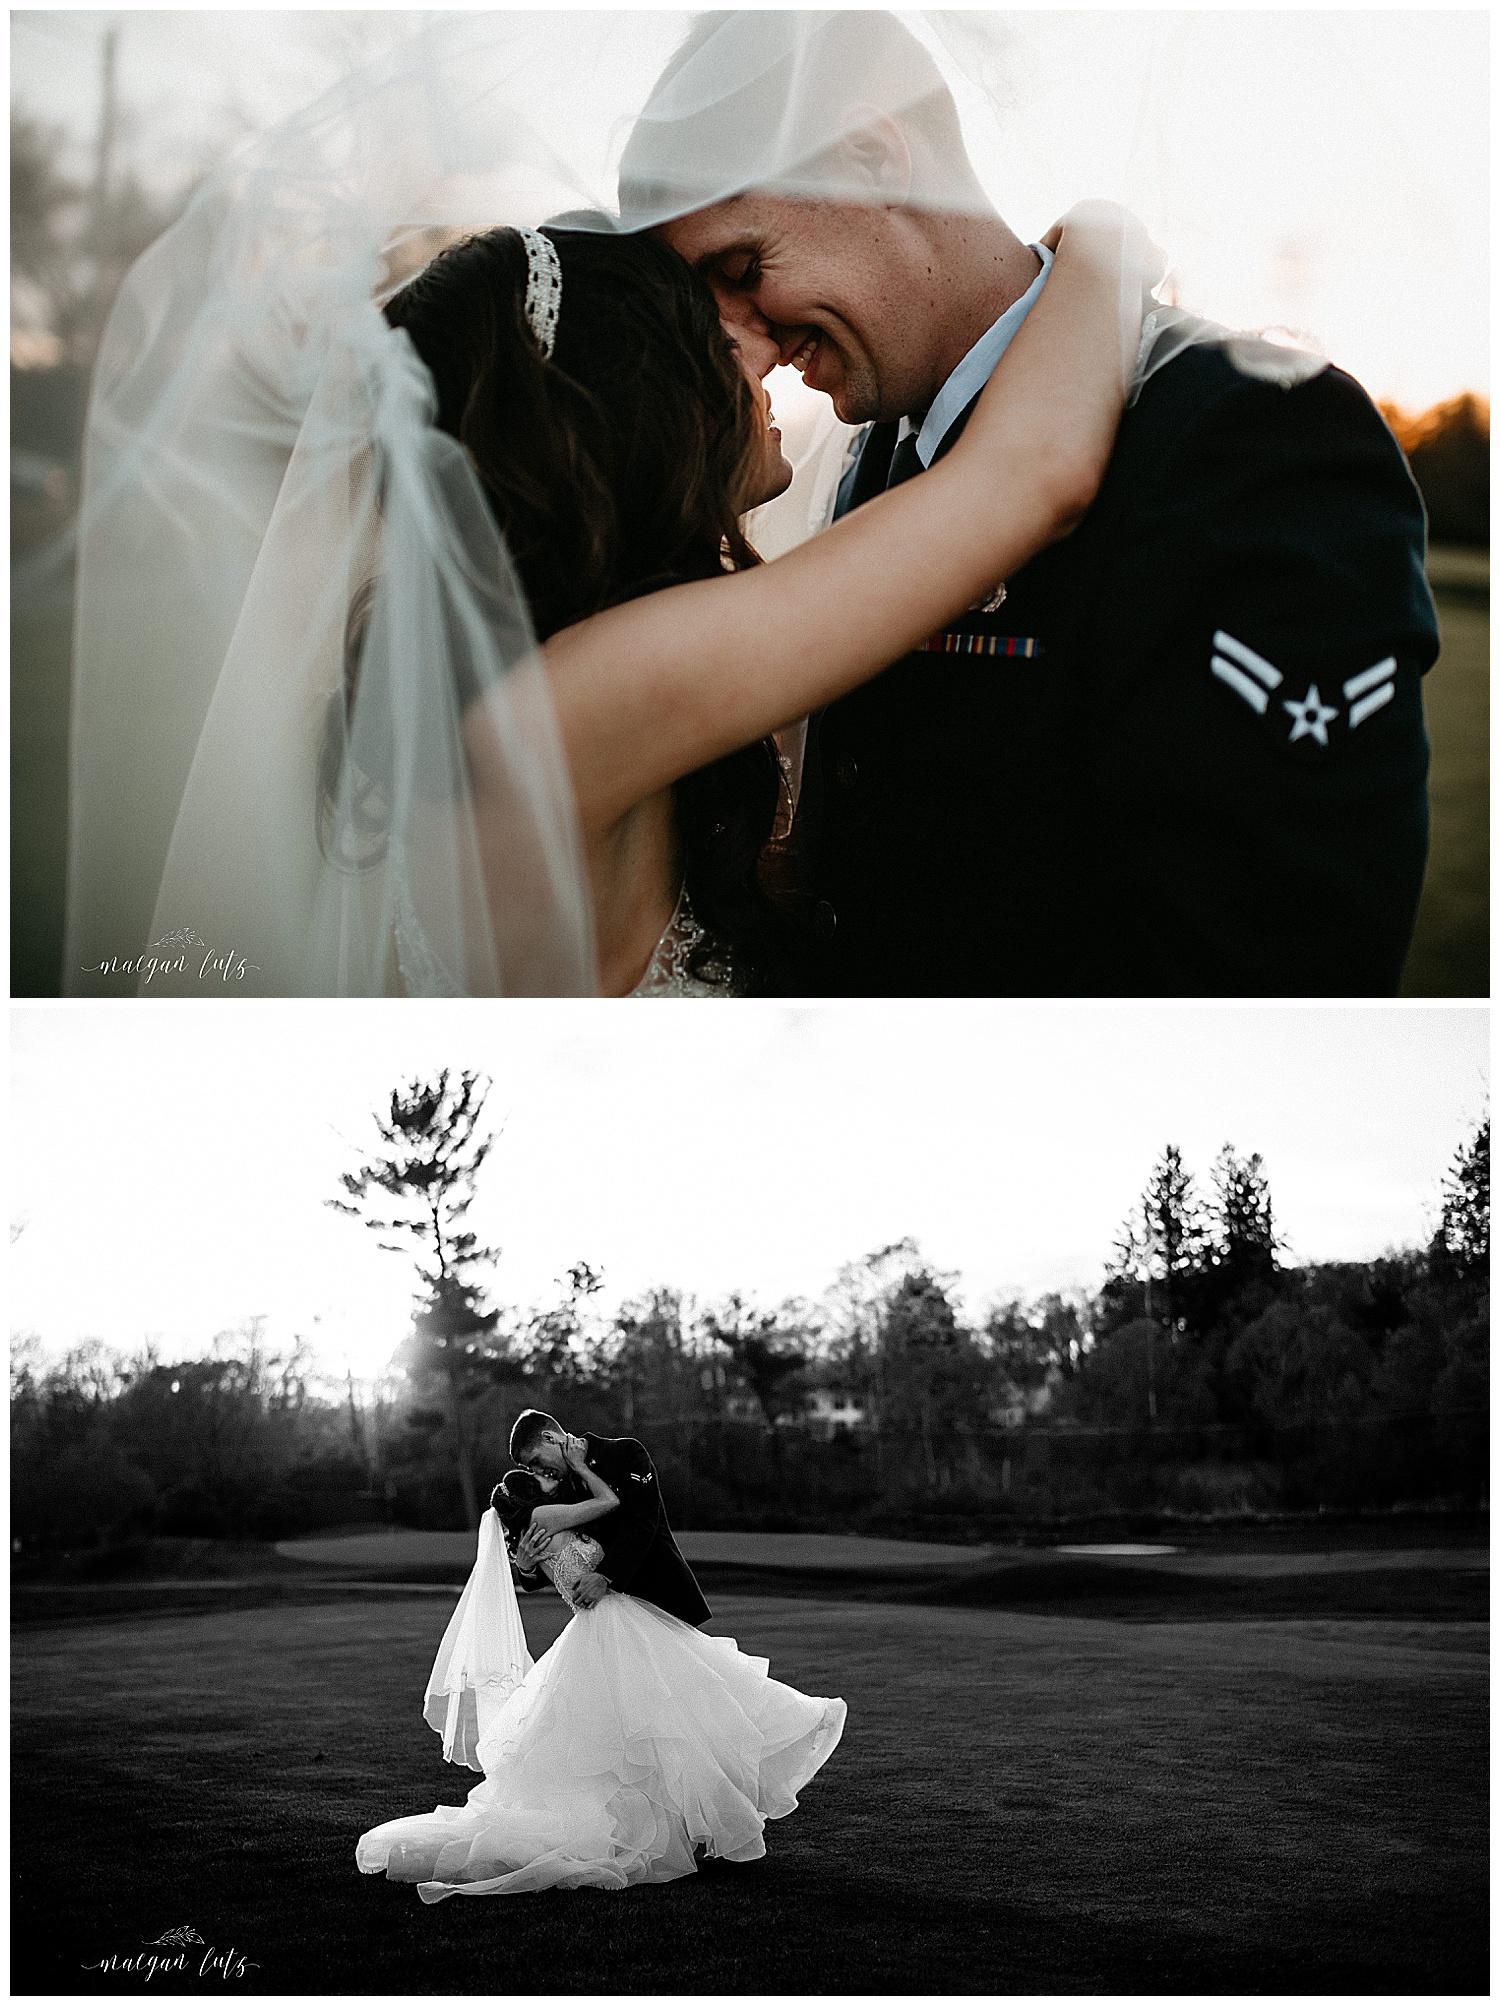 NEPA-Lehigh-Valley-Wedding-Photographer-at-Glen-Oak-Country-Club-Clarks-Summit-PA_0068.jpg